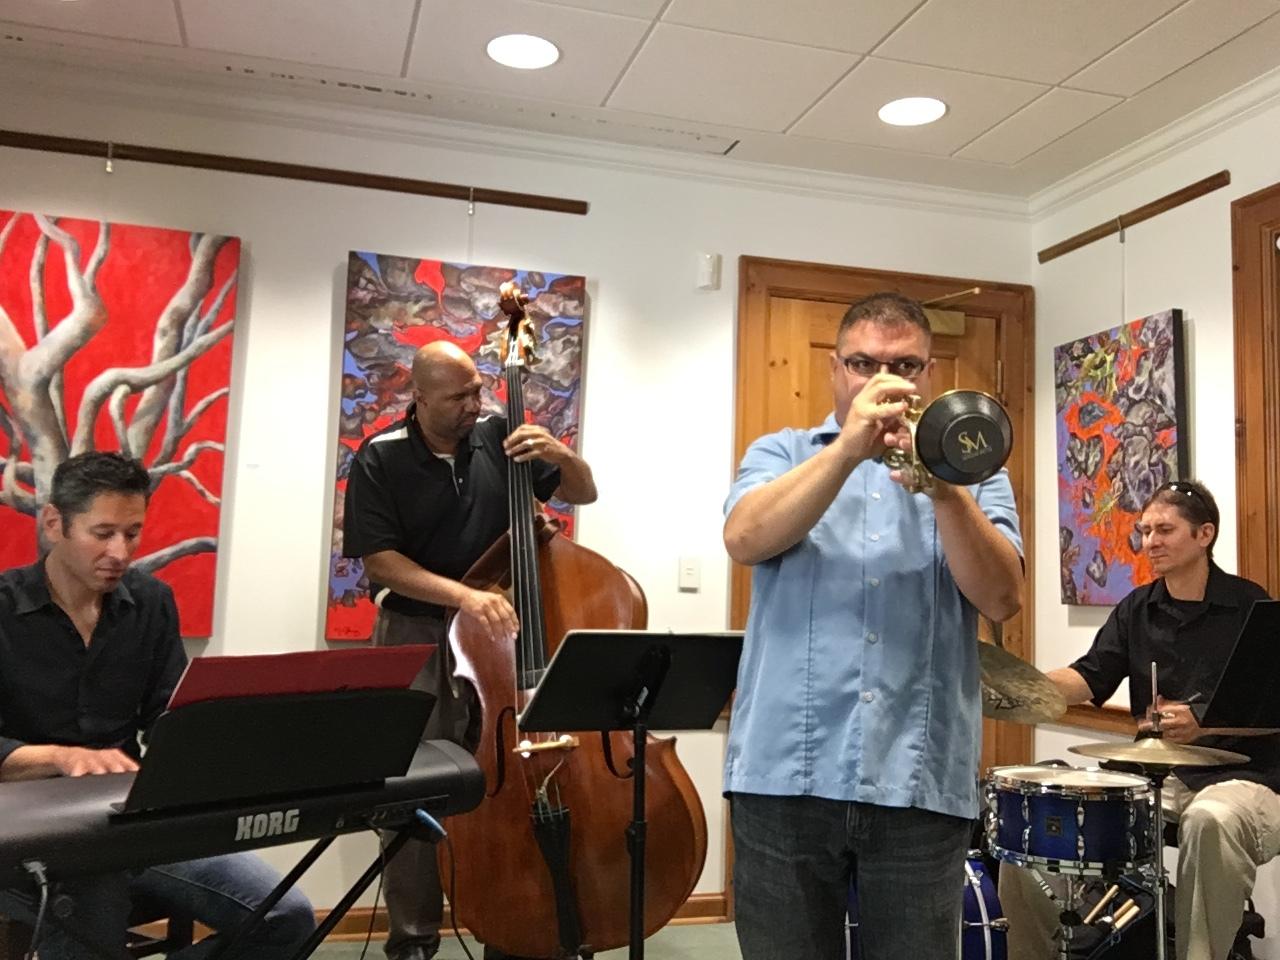 LtoR Dan Baily, Alan Gleghorn, Myself, Ricky Exton-Jazz History Library Series